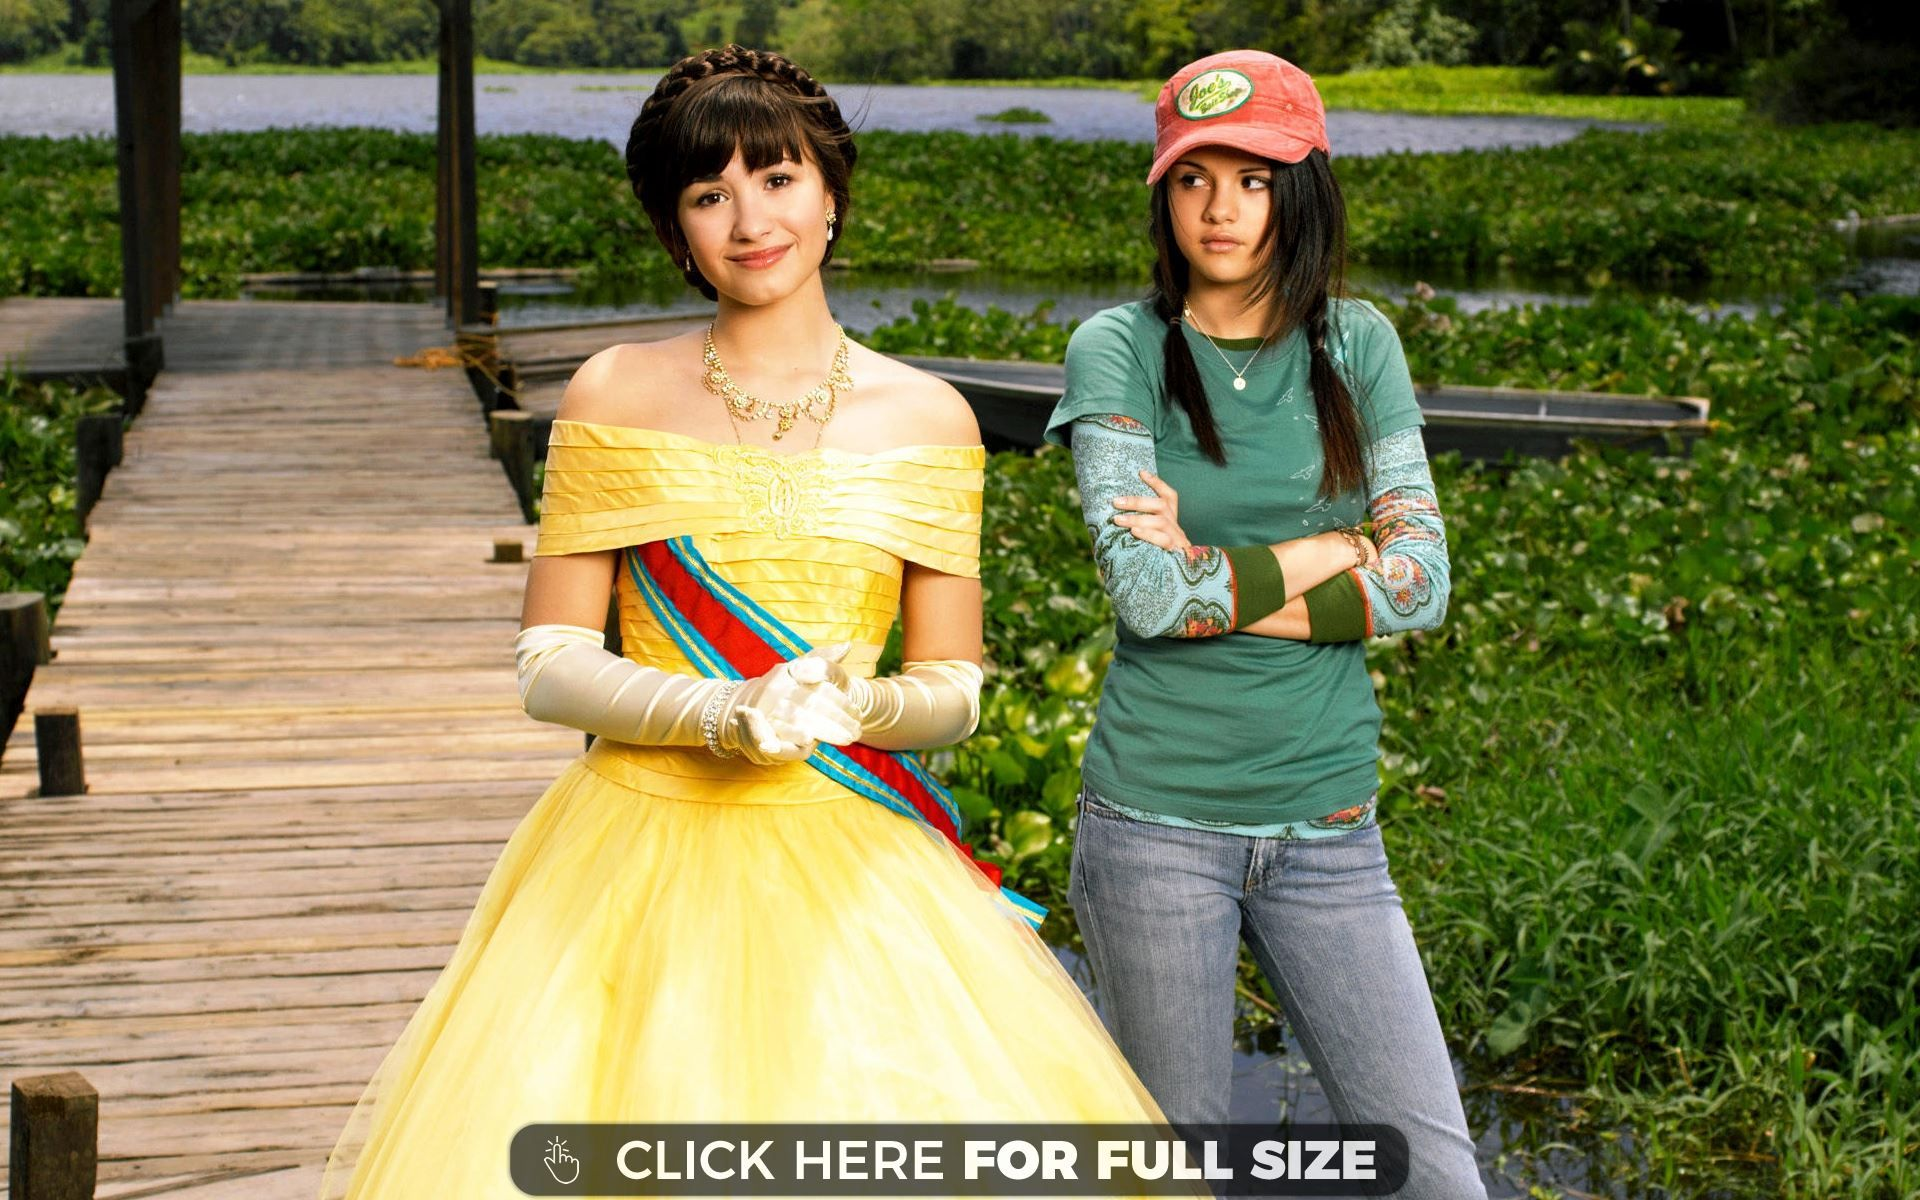 Demi Lovato Wallpaper Princess Protection Program Demi Lovato Selena Gomez Images